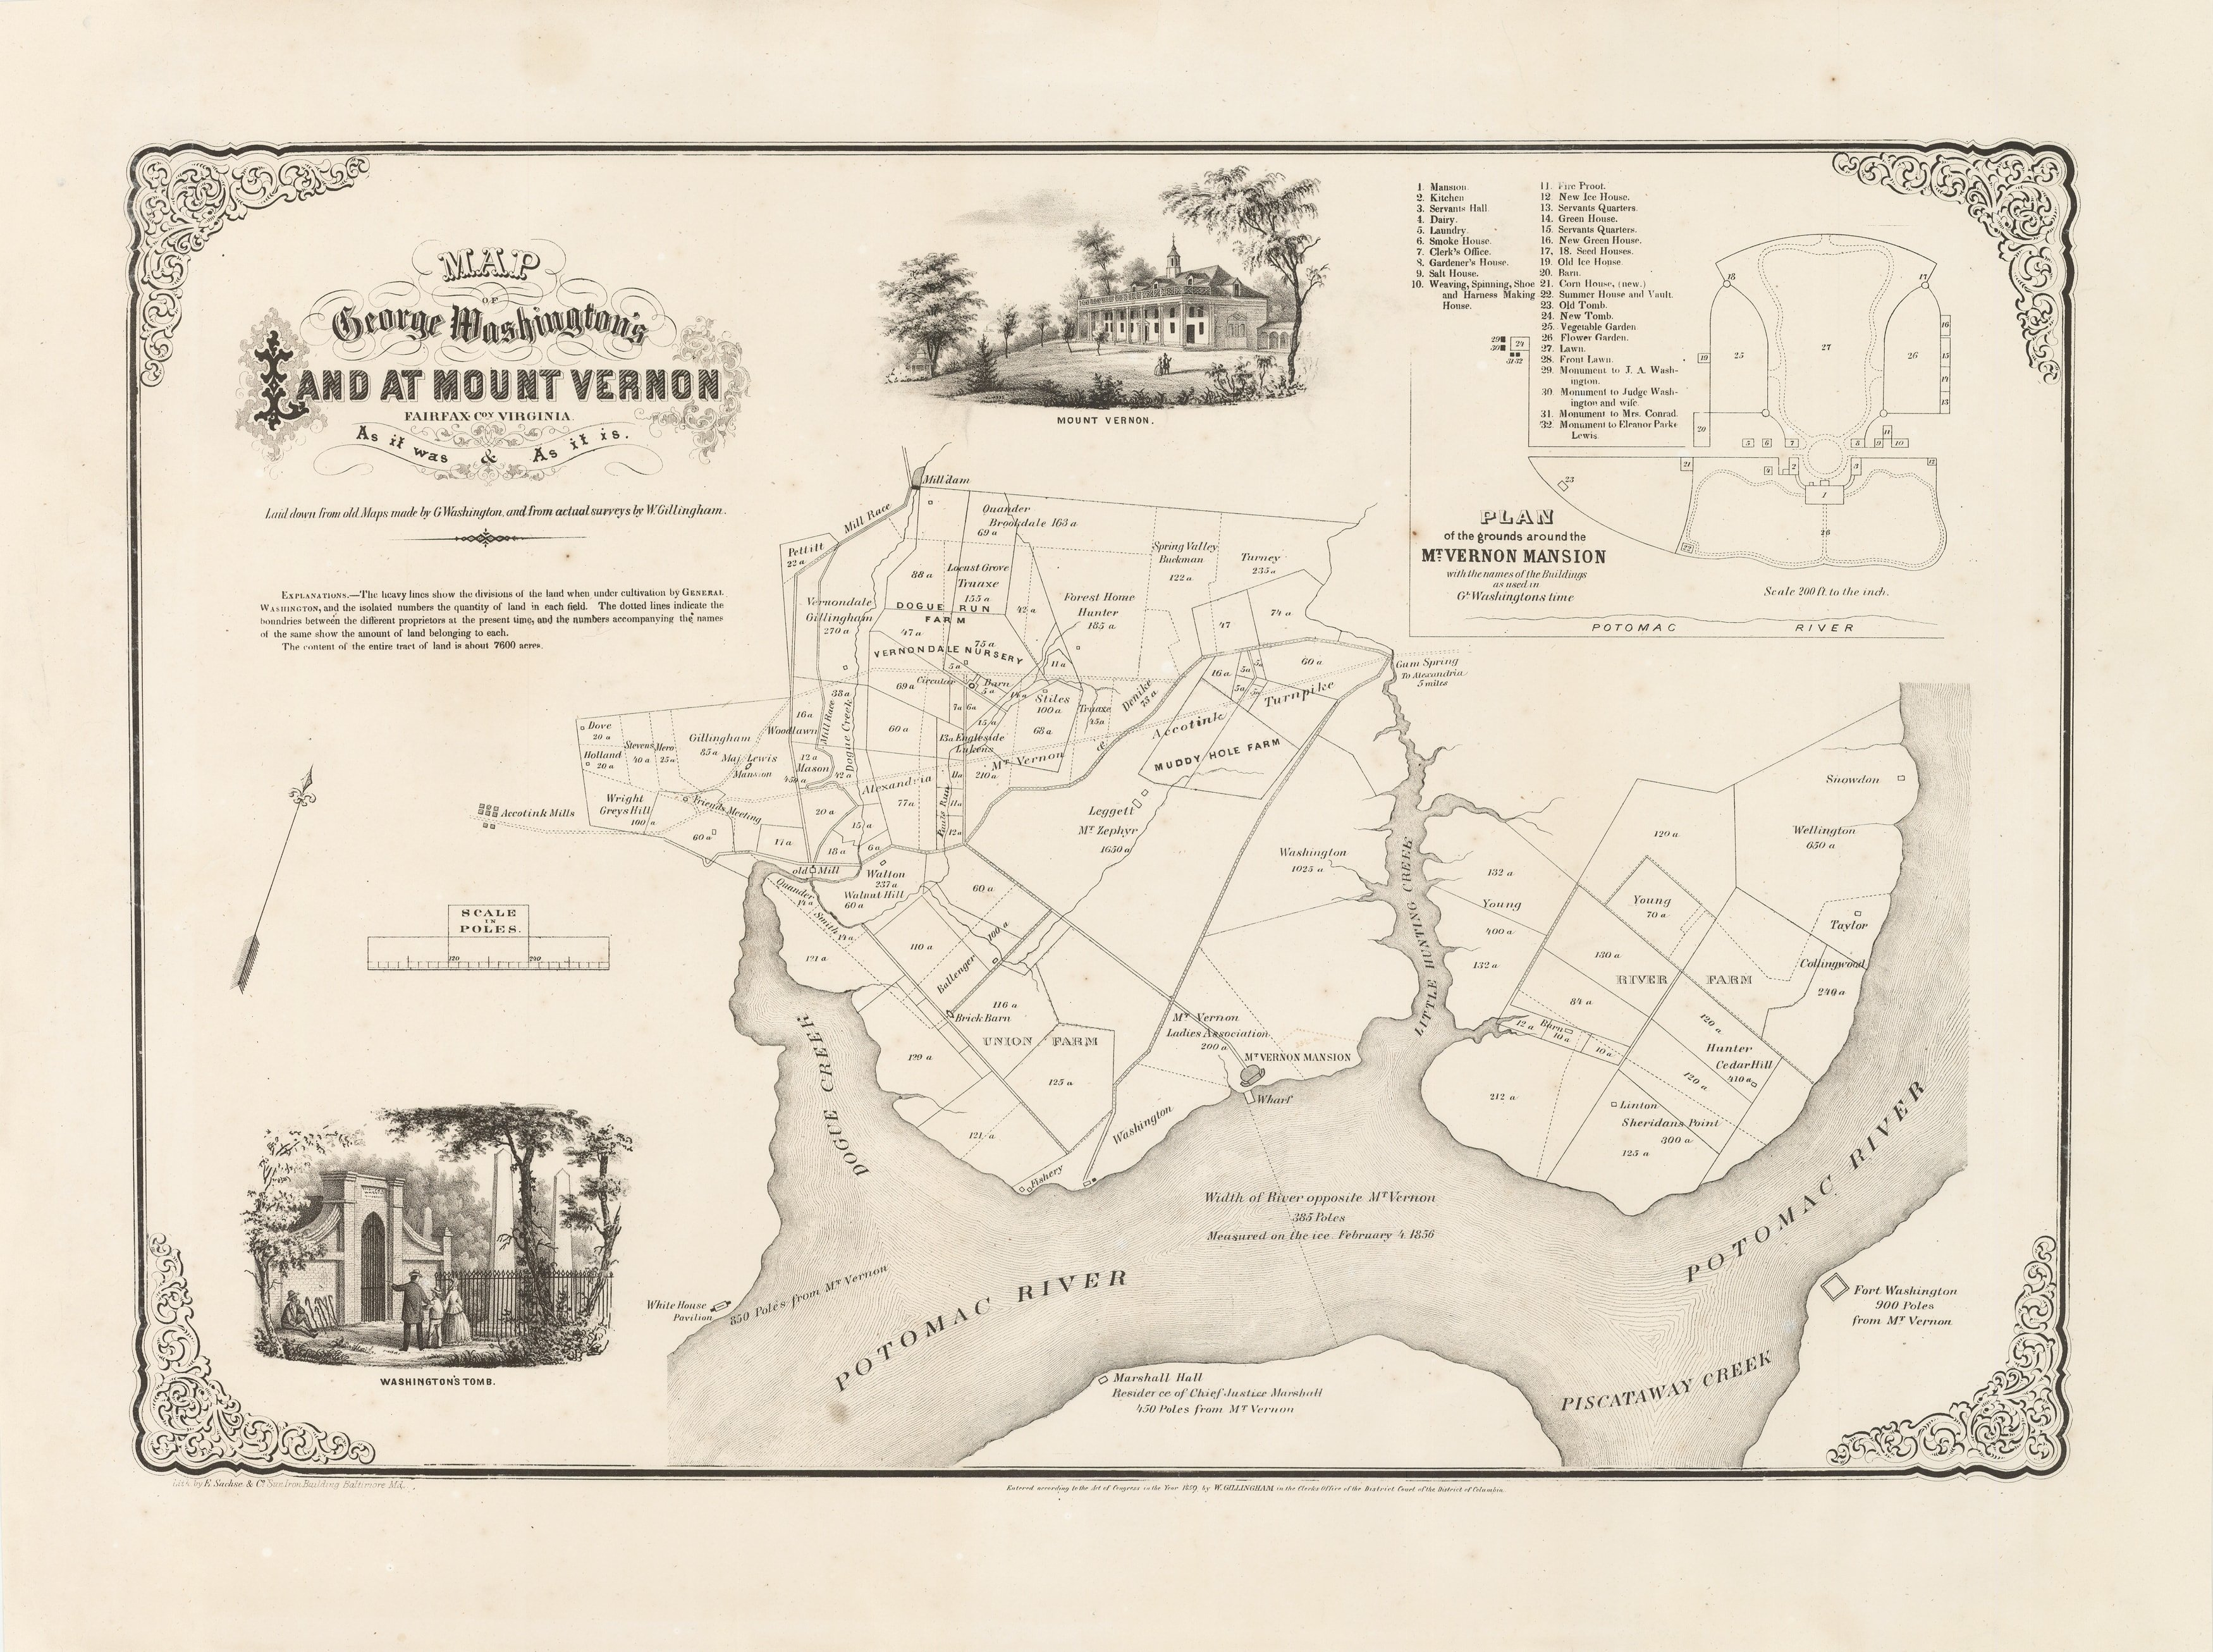 Mt Vernon Washington Map.Rare And Detailed 1859 Map Of George Washington S Mount Vernon